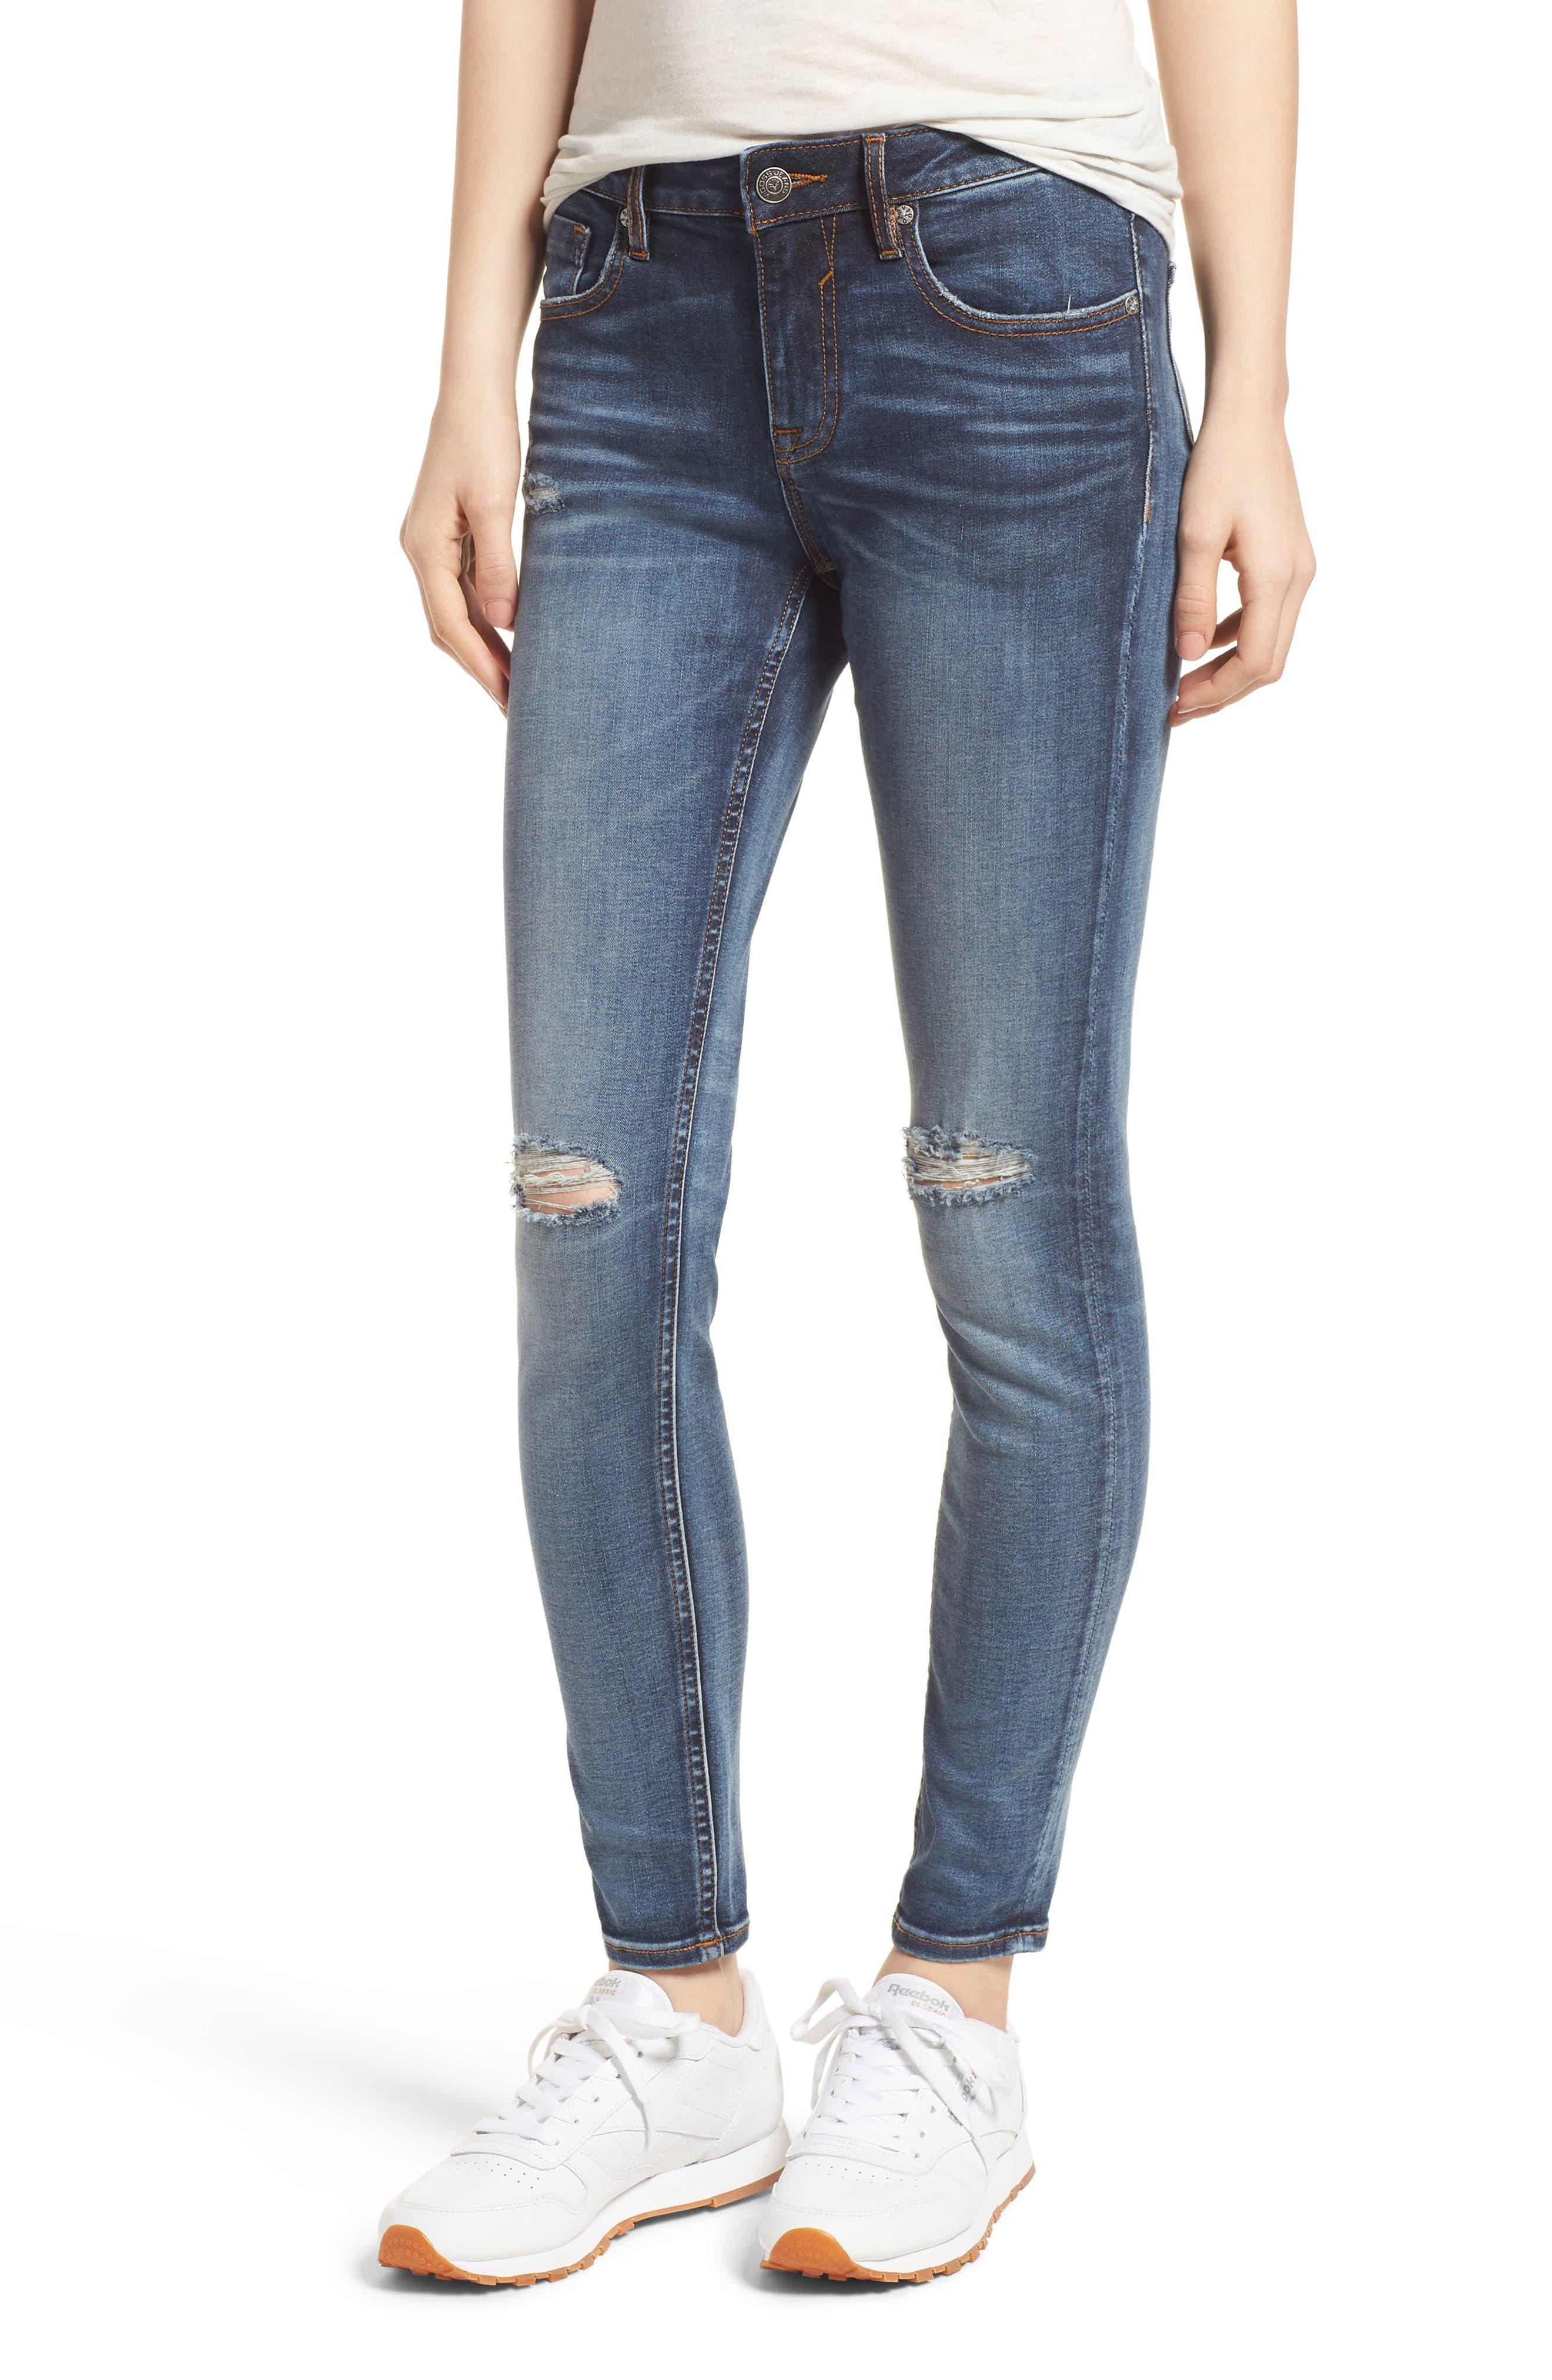 Jagger Ripped Skinny Jeans,                         Main,                         color, Dark Wash